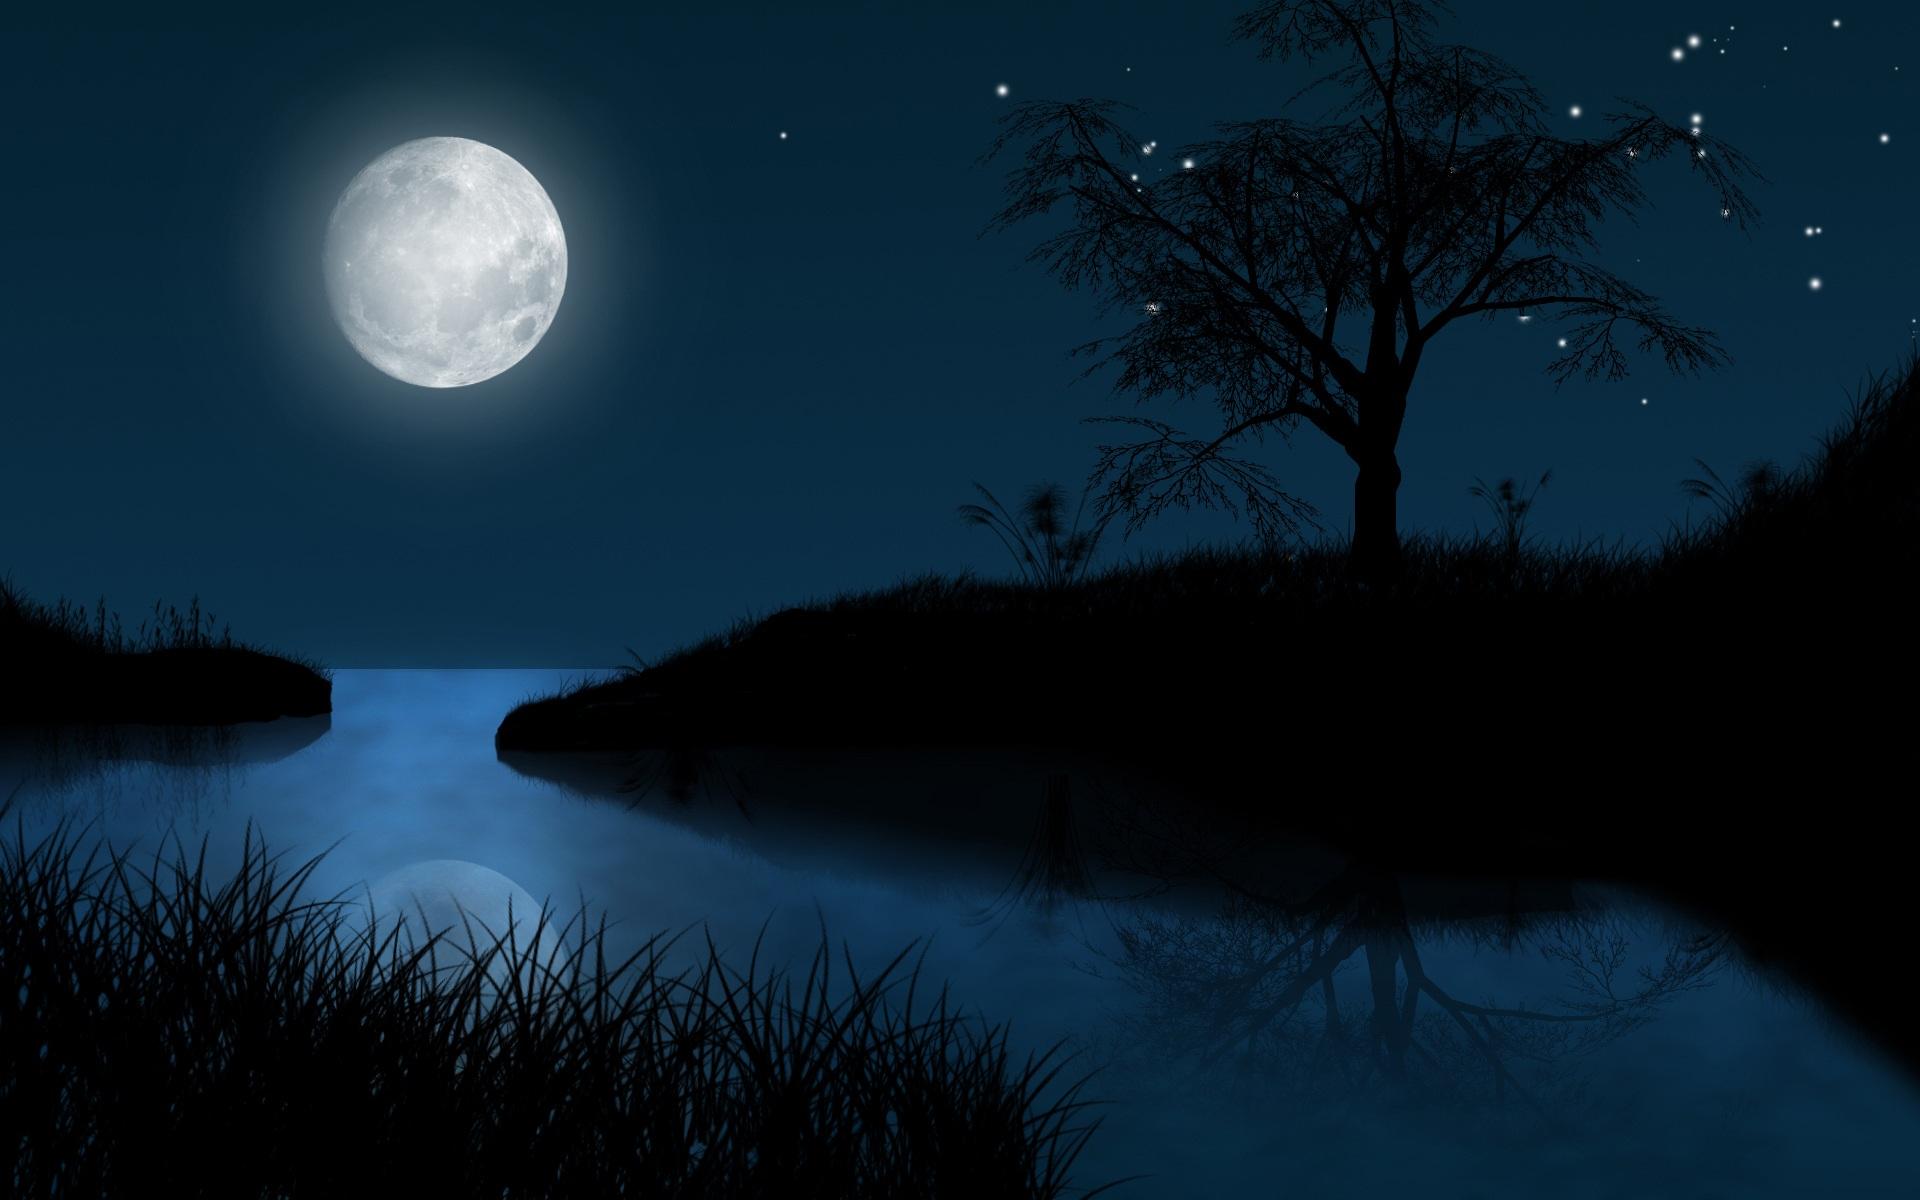 Free clipart full moon.